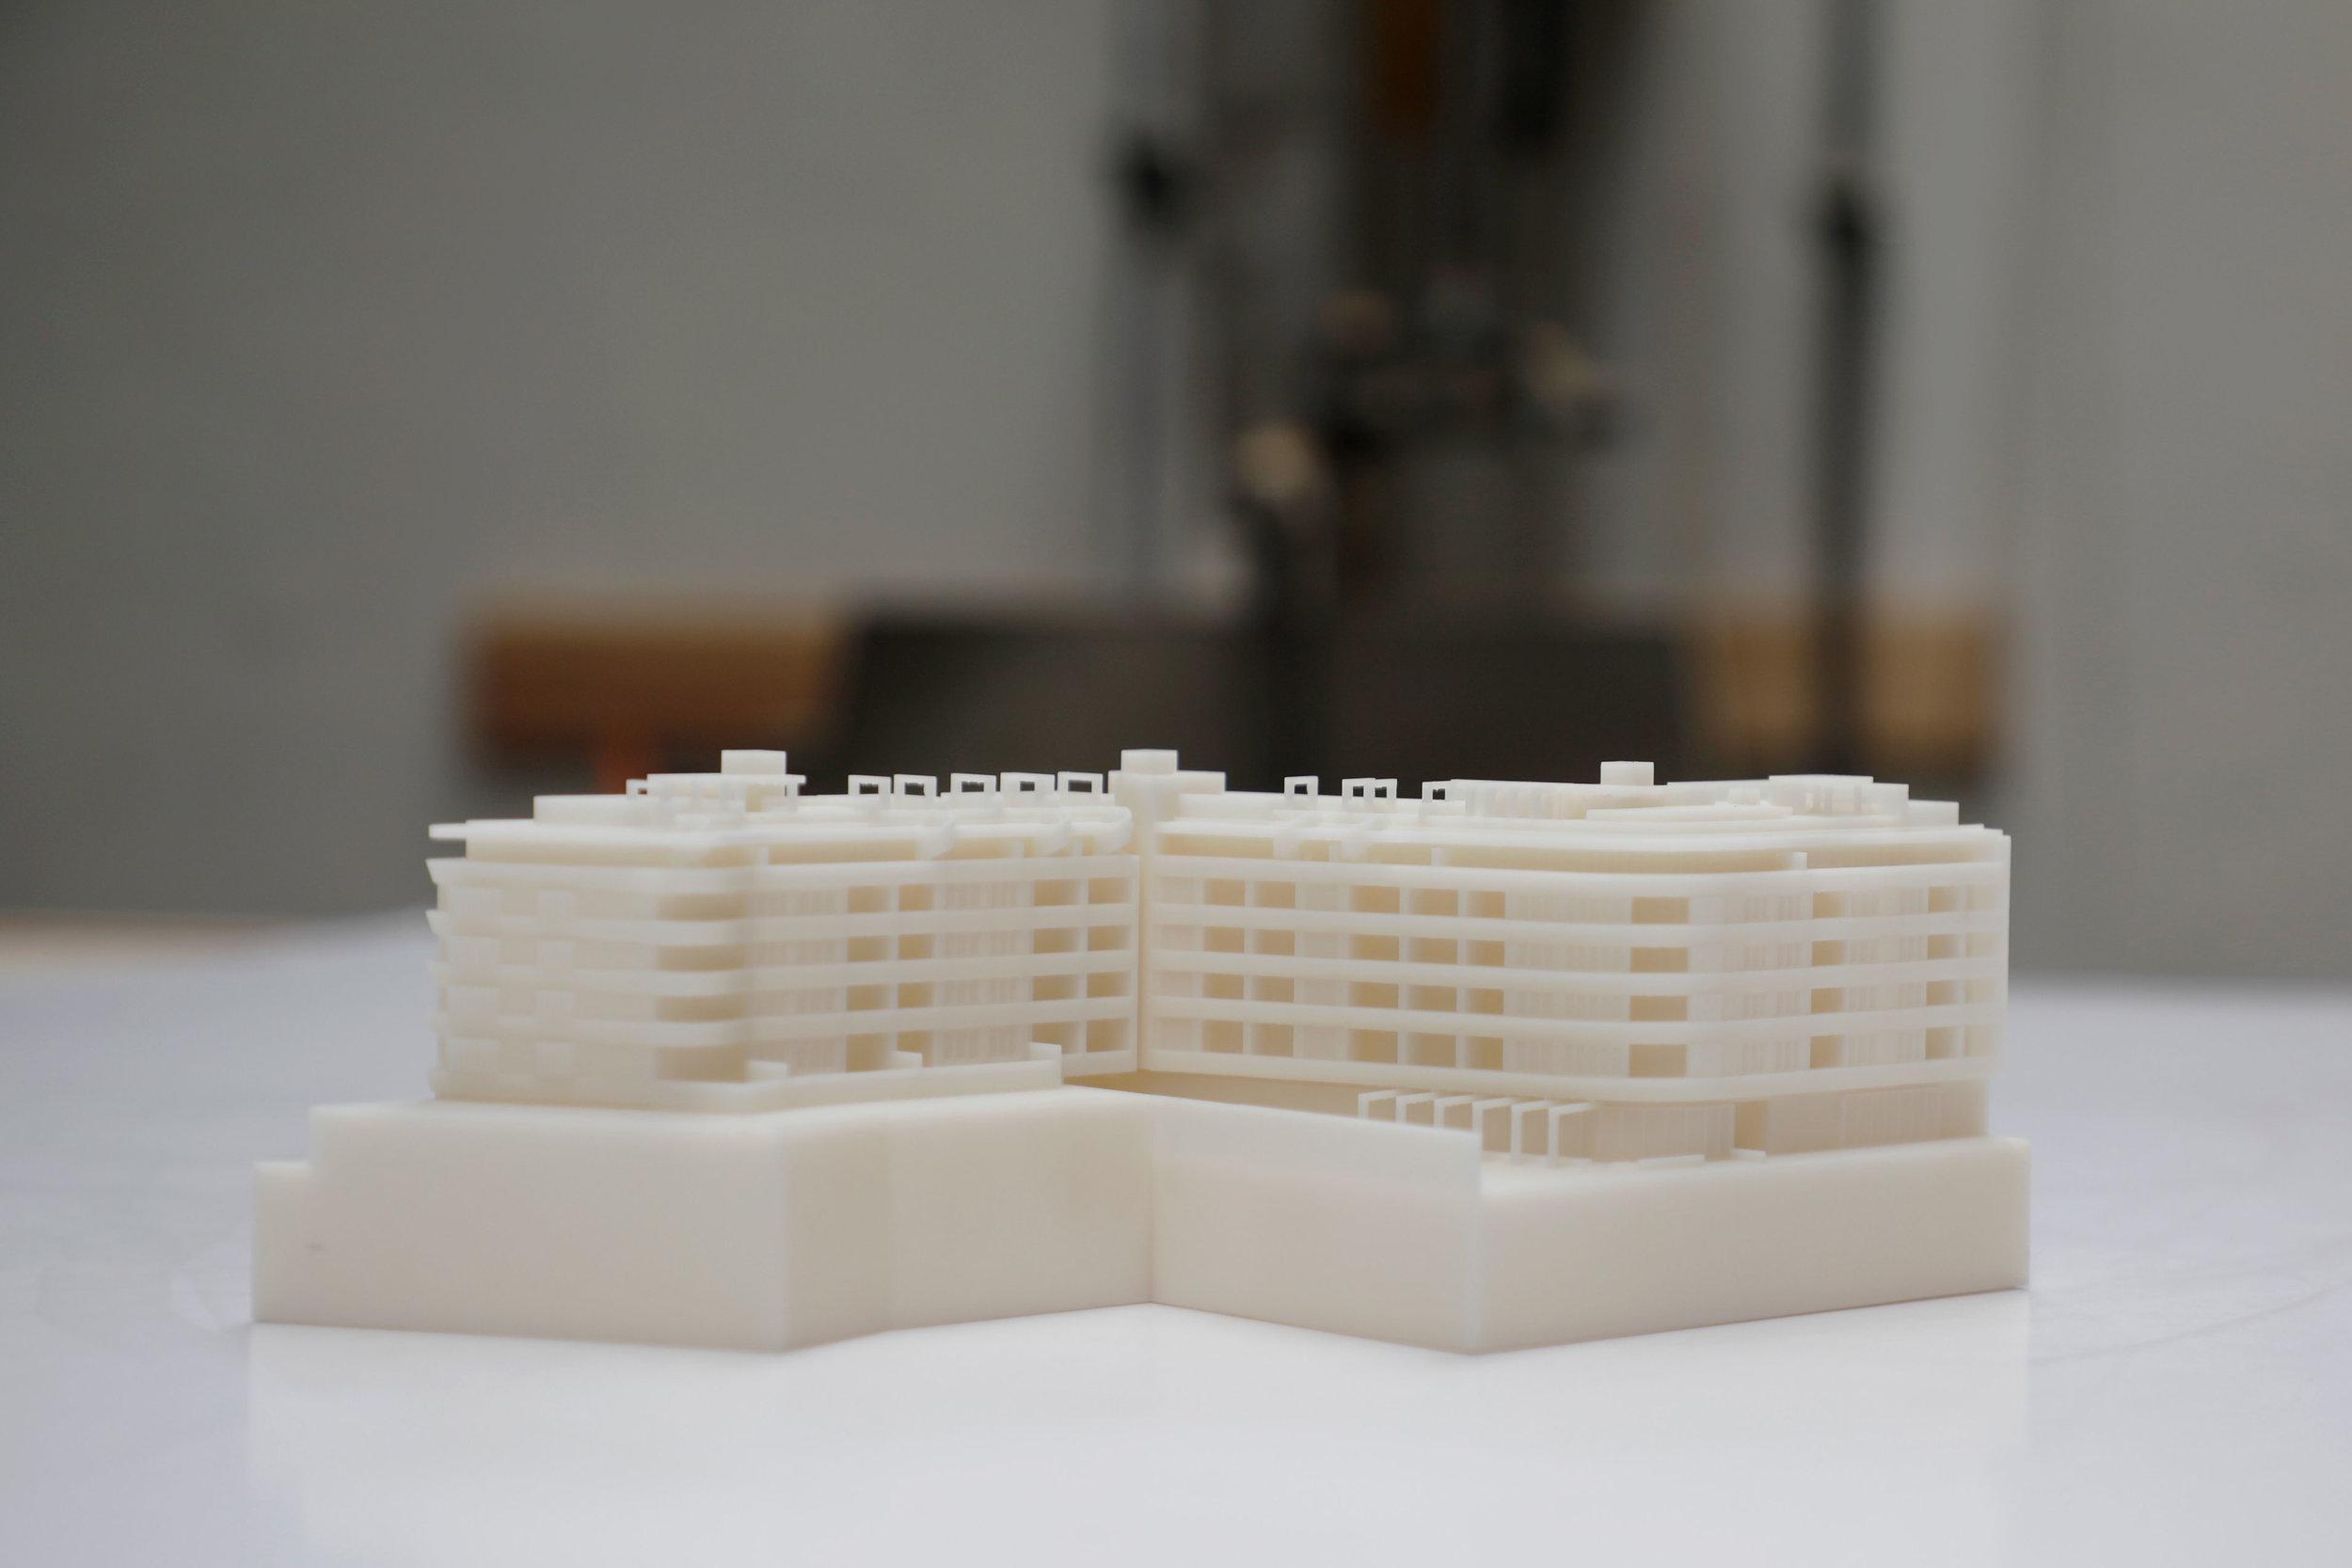 Make_models_Sydney_3D_print_scale_architecture3.jpg